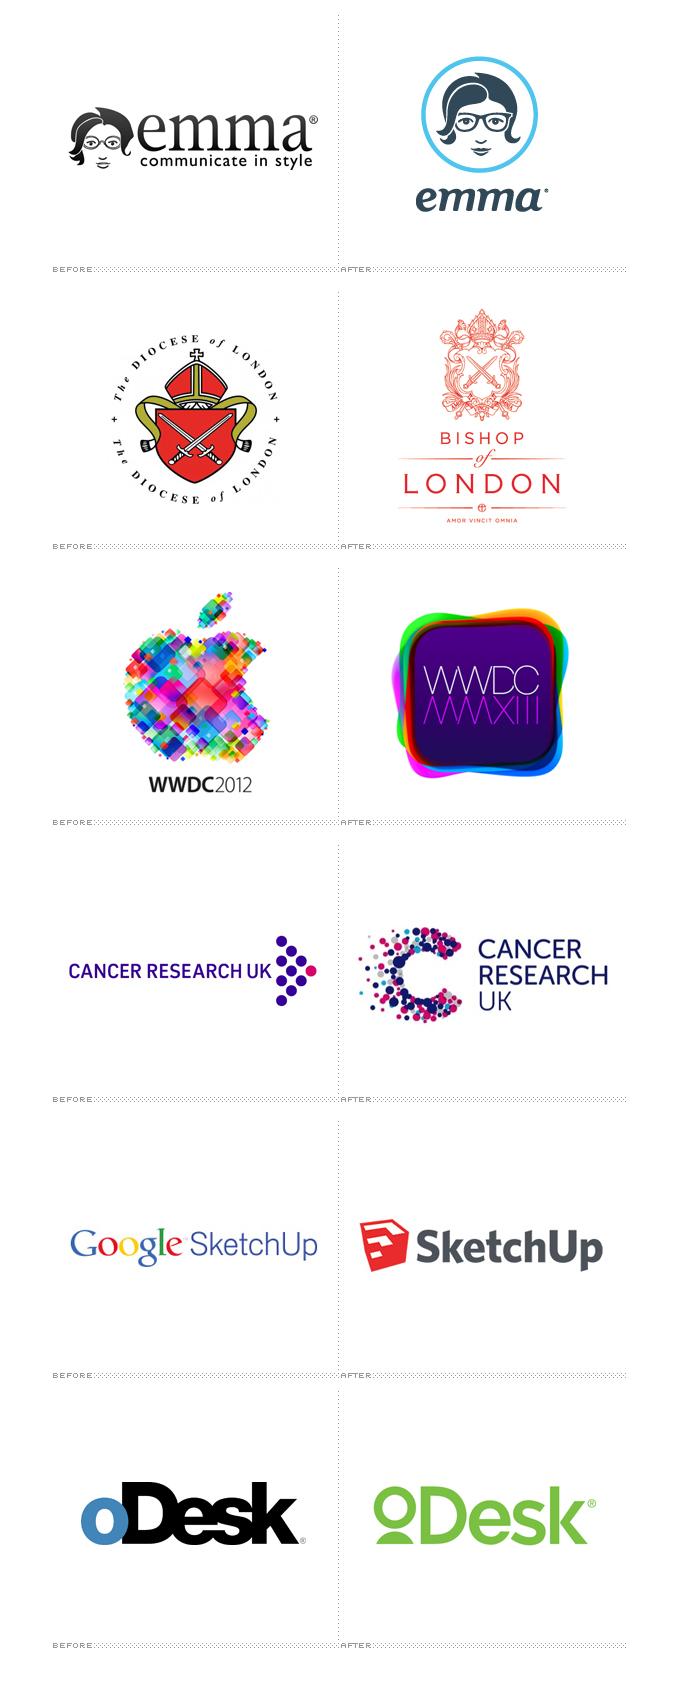 rebrand-examples